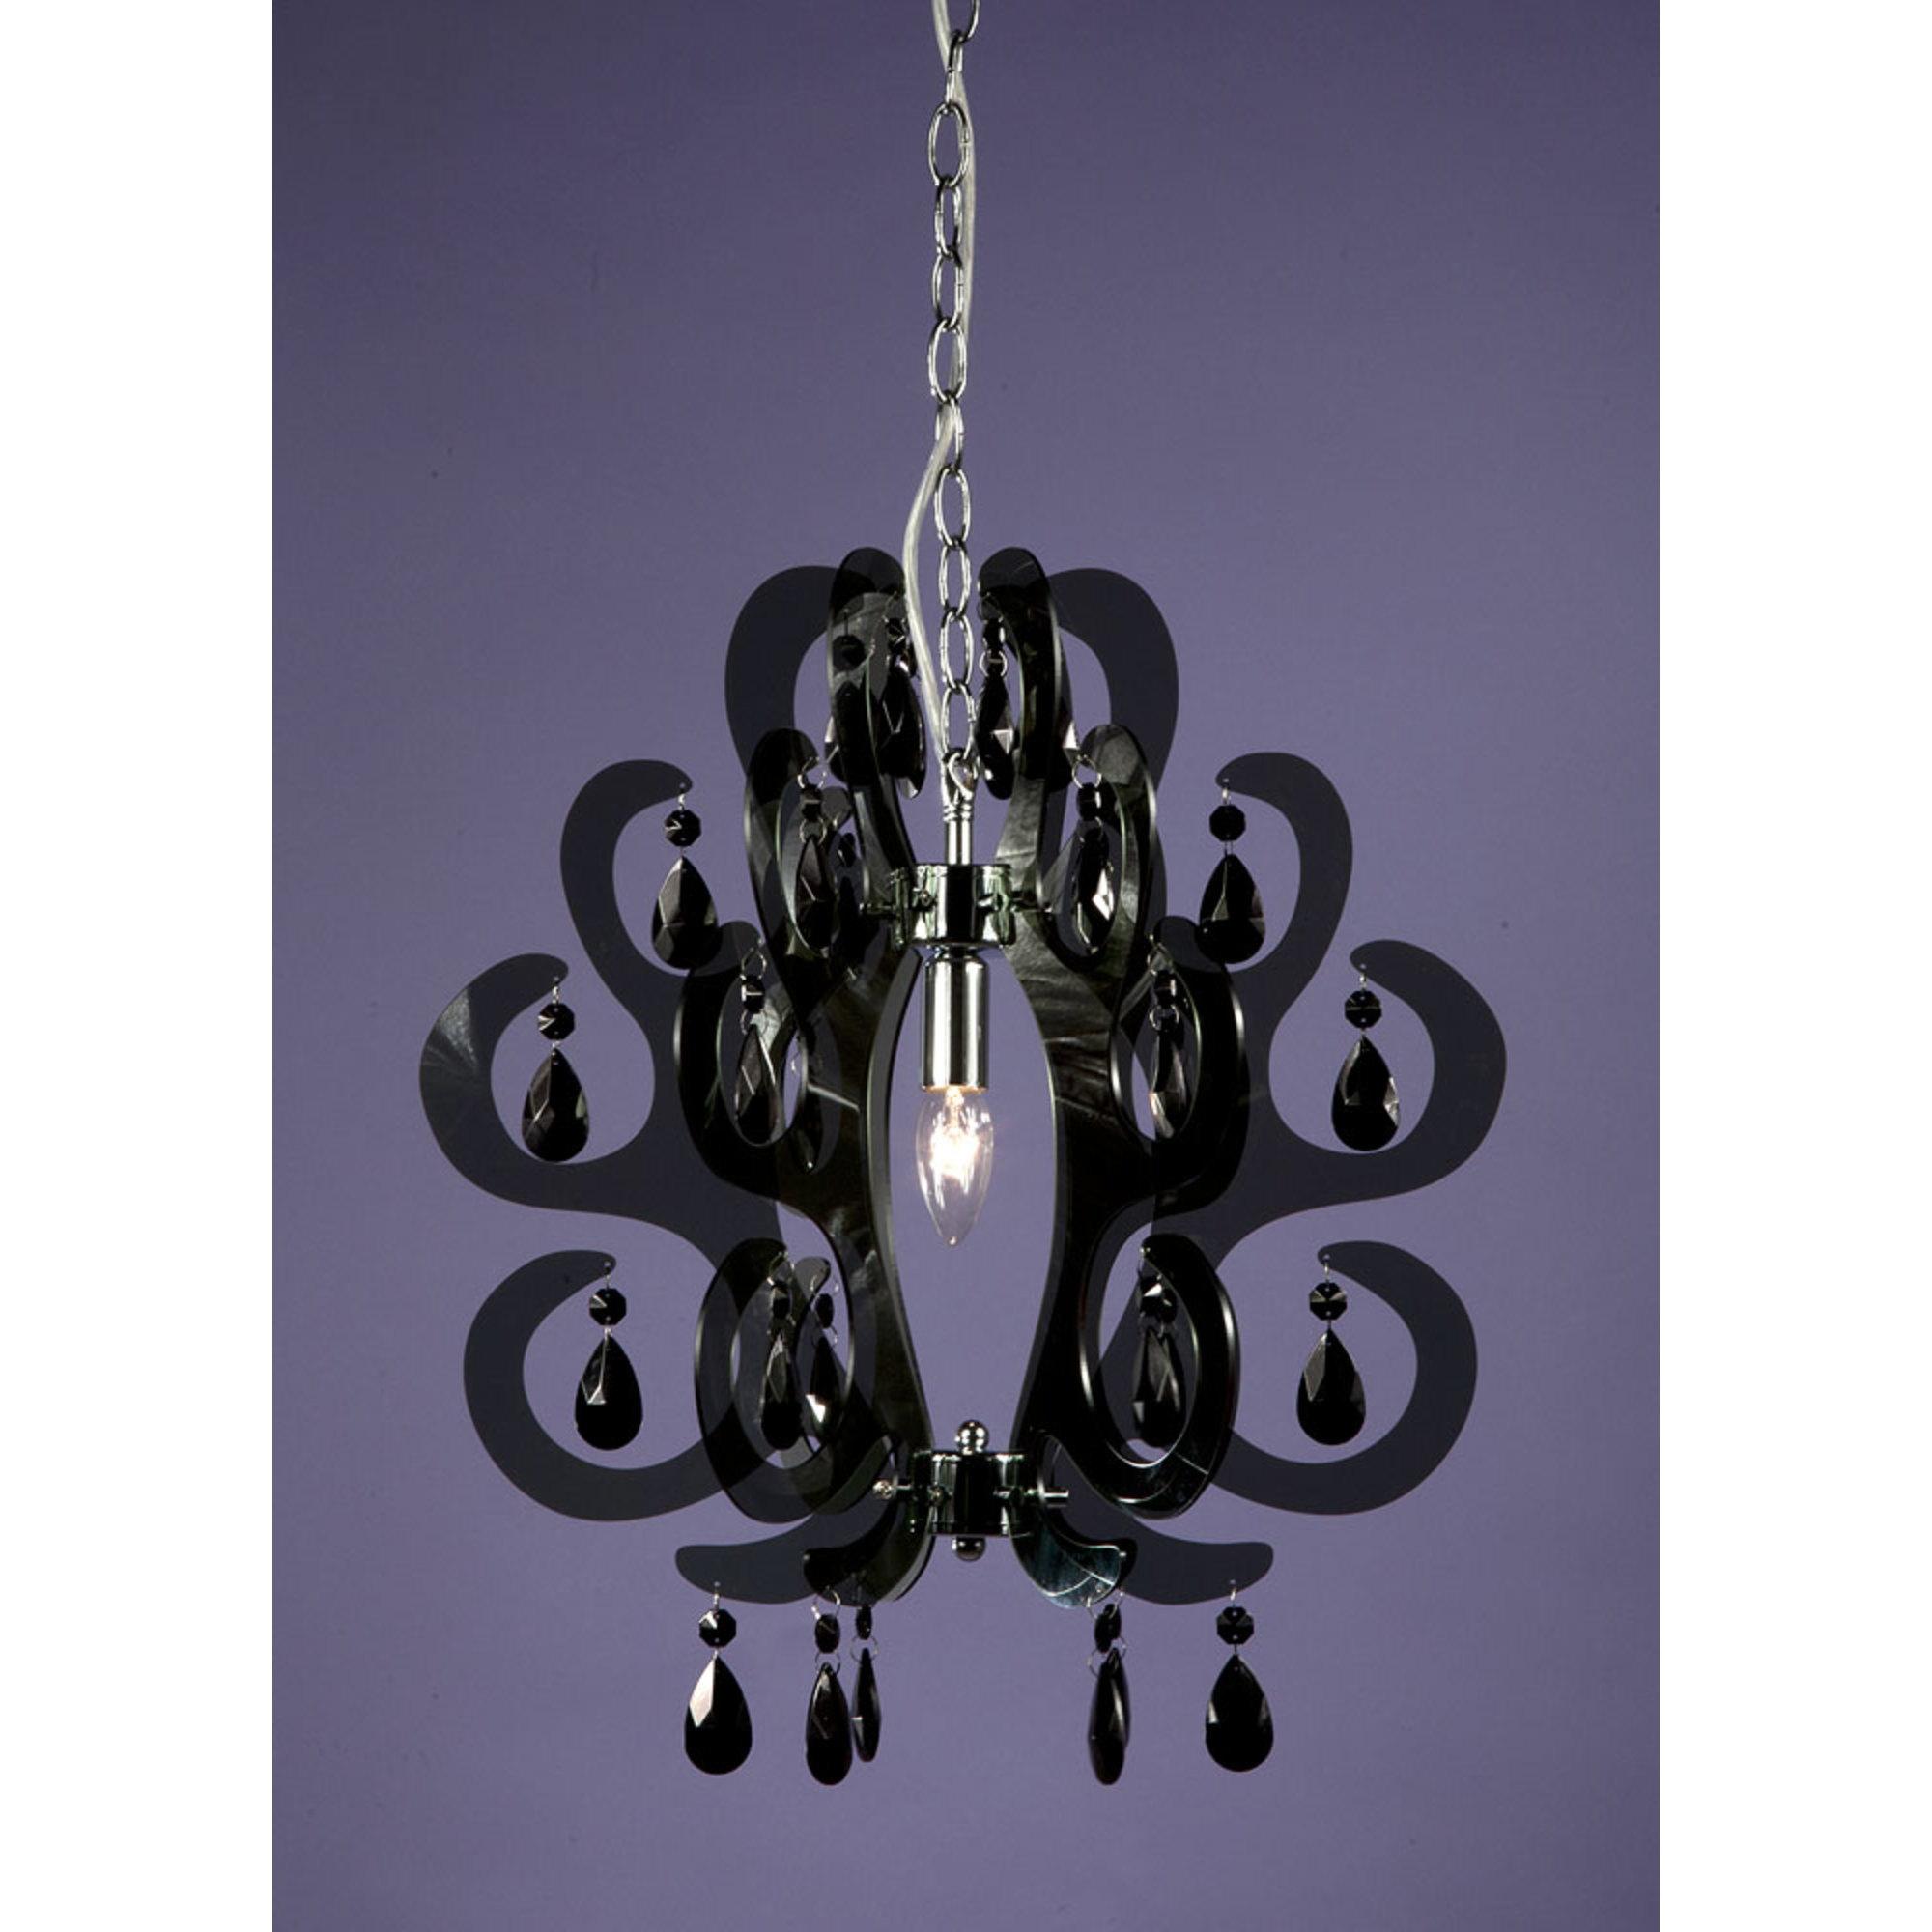 Curl Acrylic Ceiling Light - Black